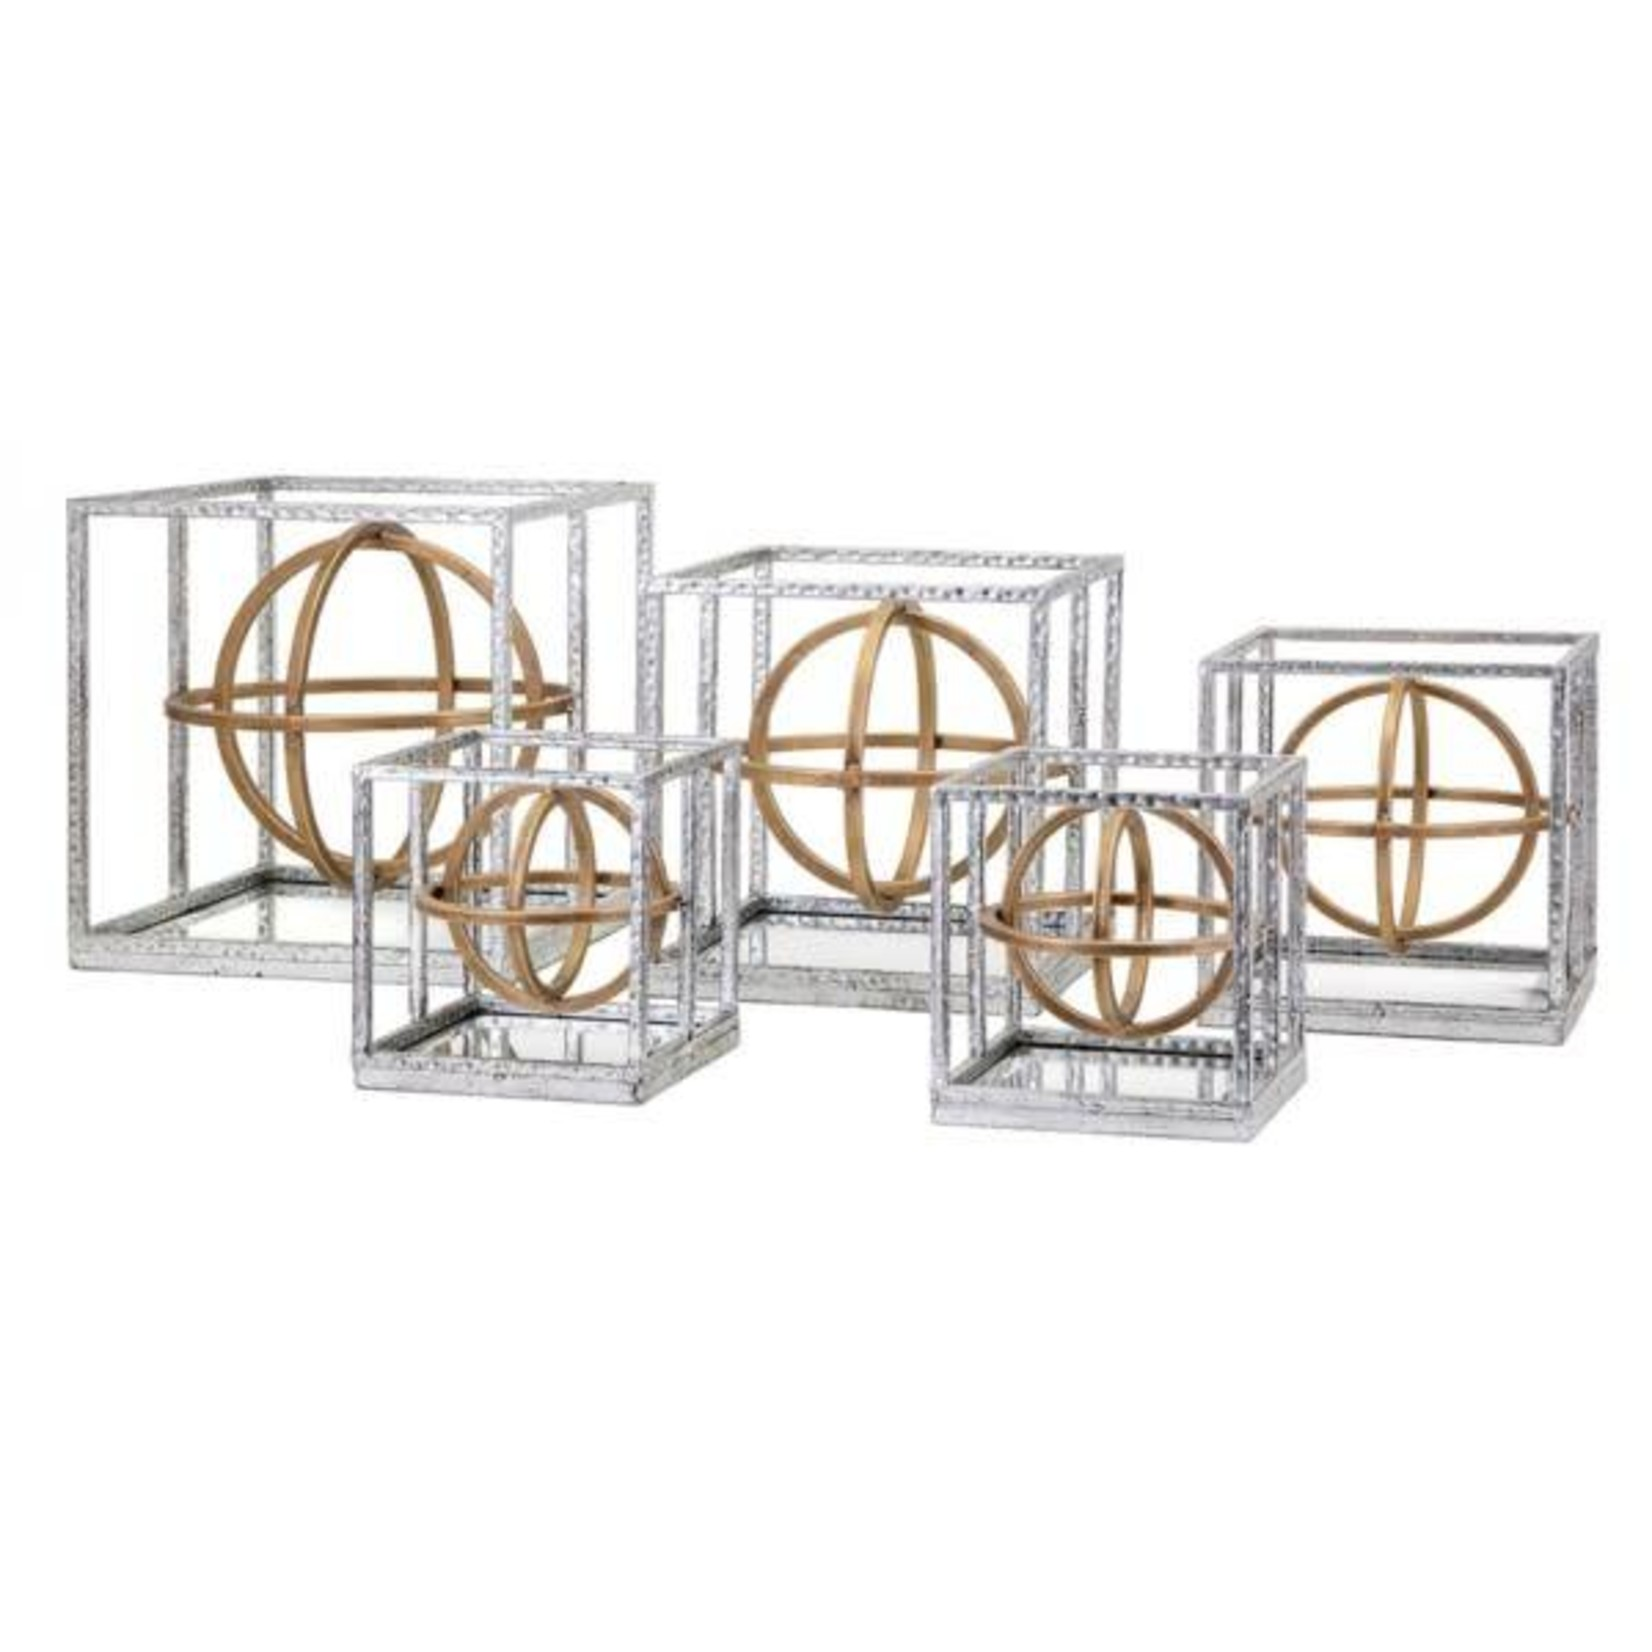 Arlette Dimensional Mirror Wall Decor - Set of 5